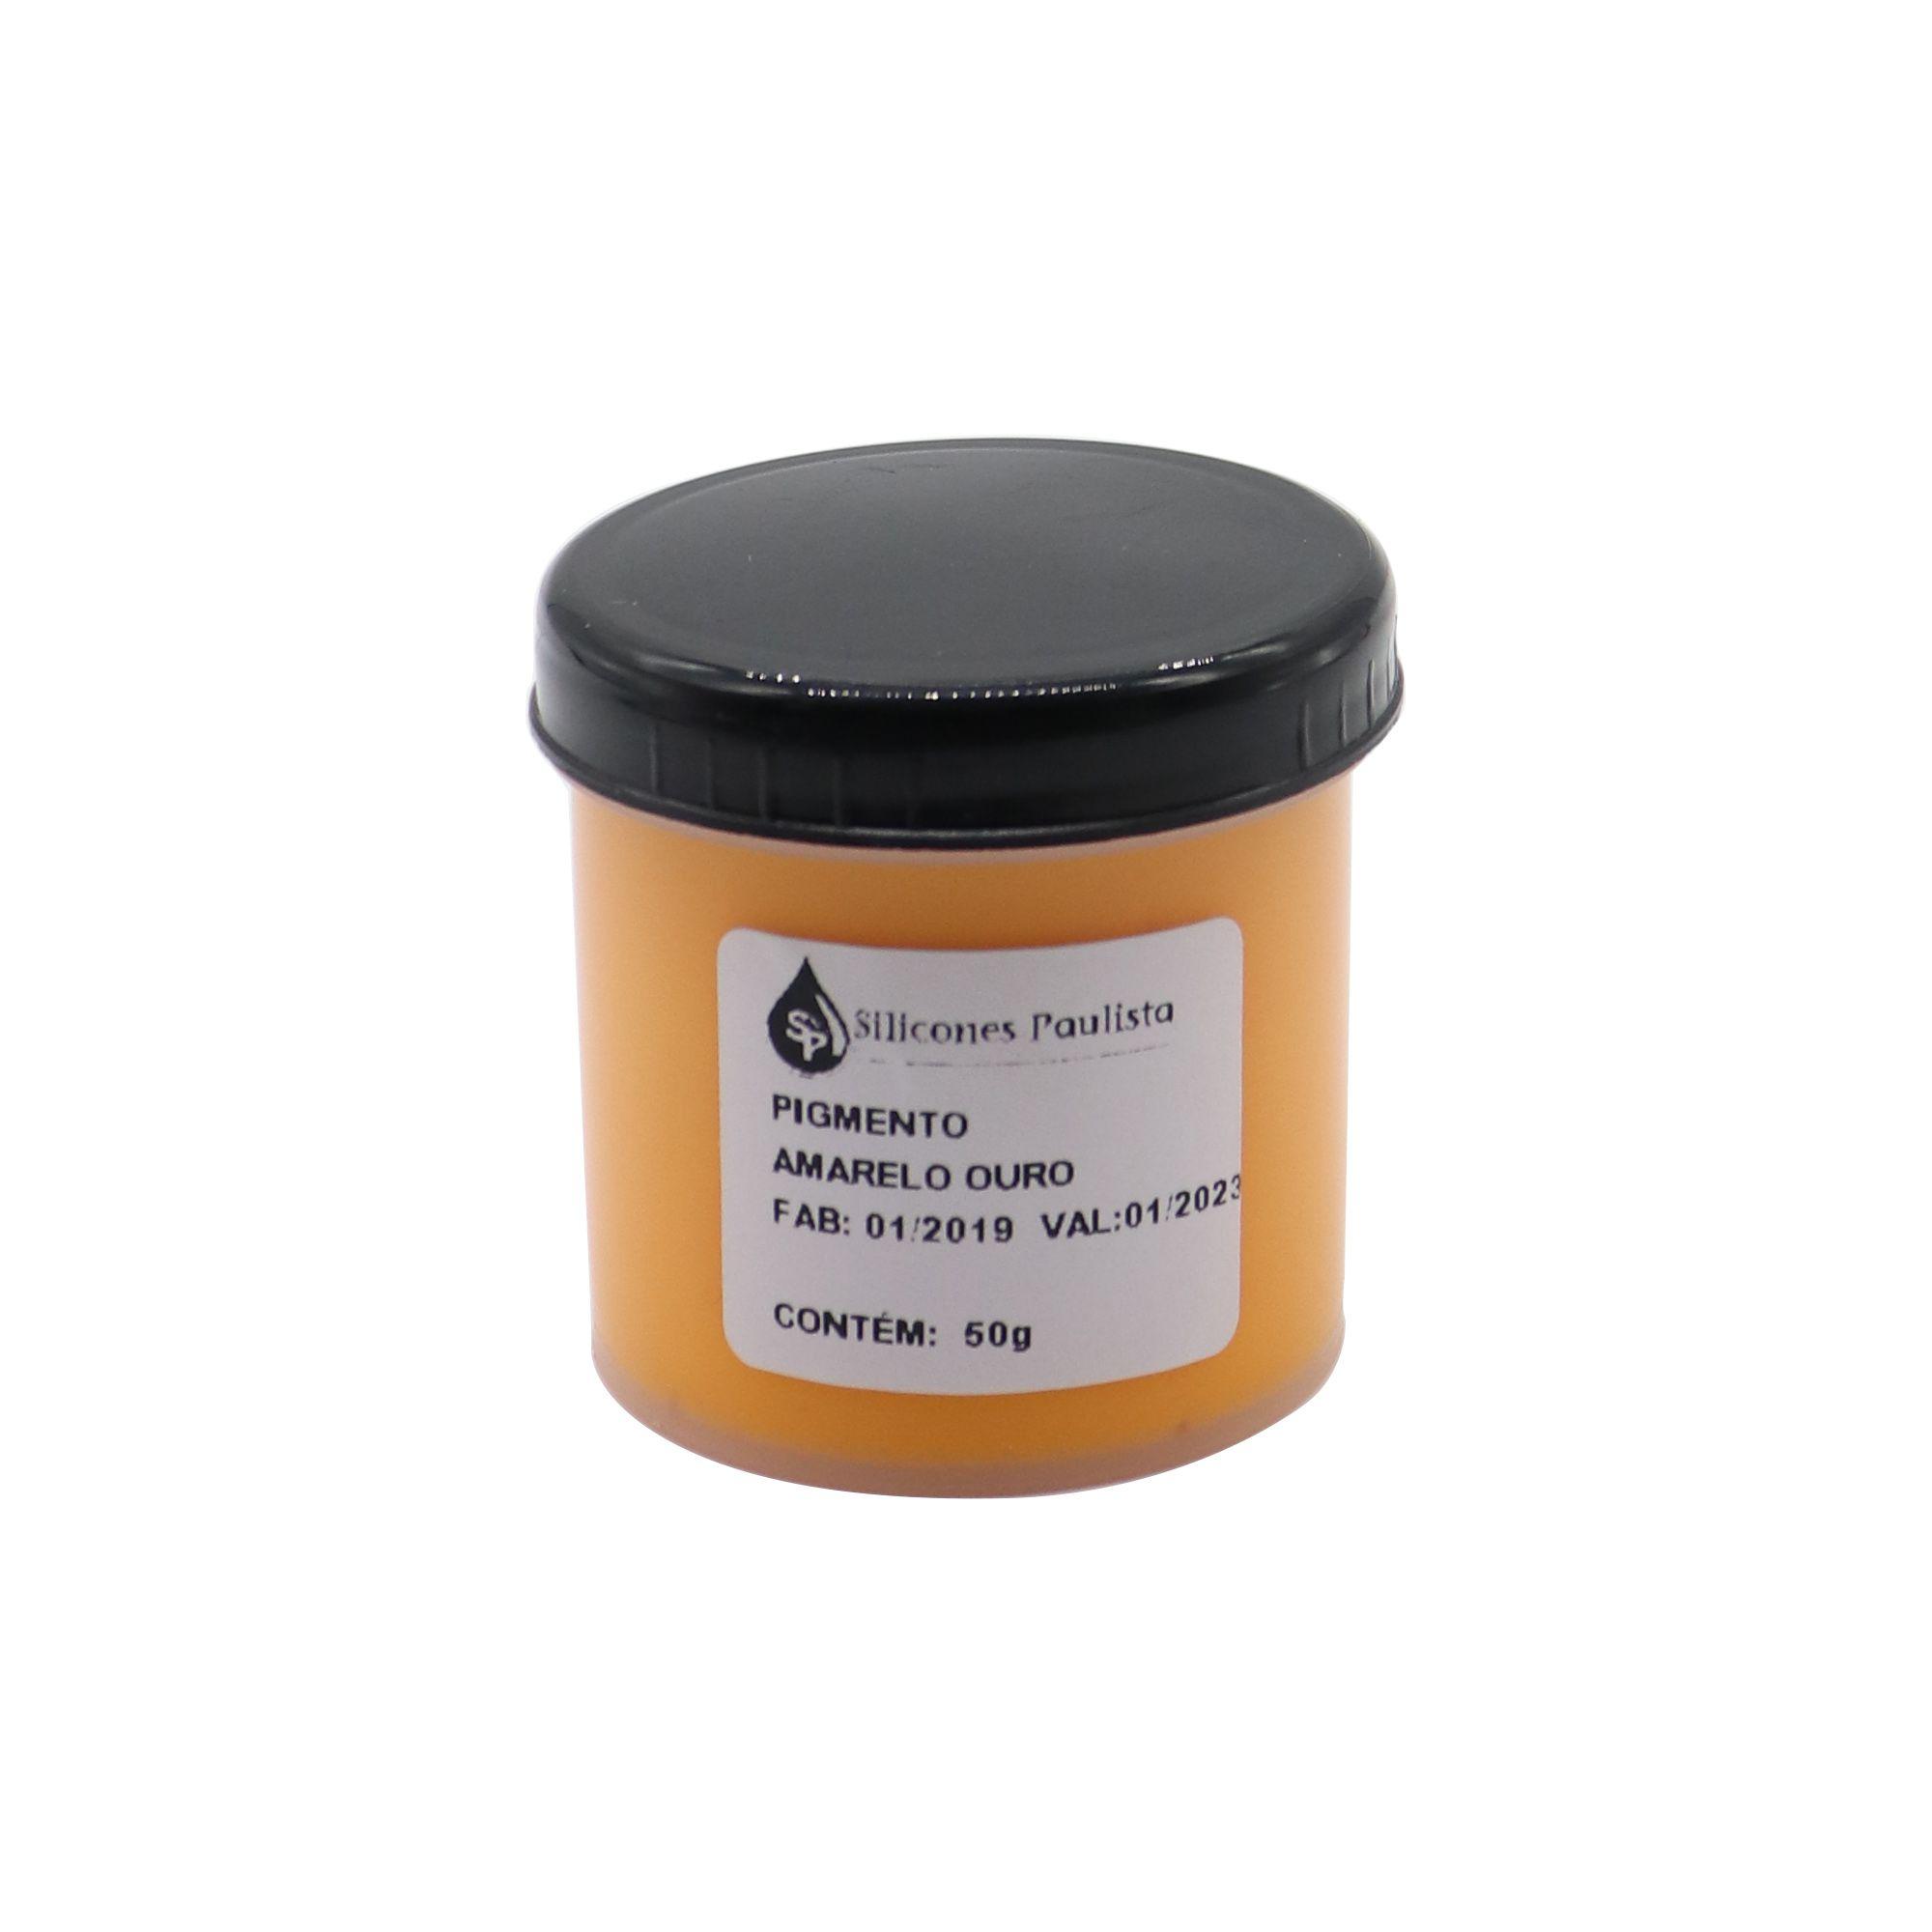 Pigmento pra Resina e Borracha 50g - Amarelo ouro